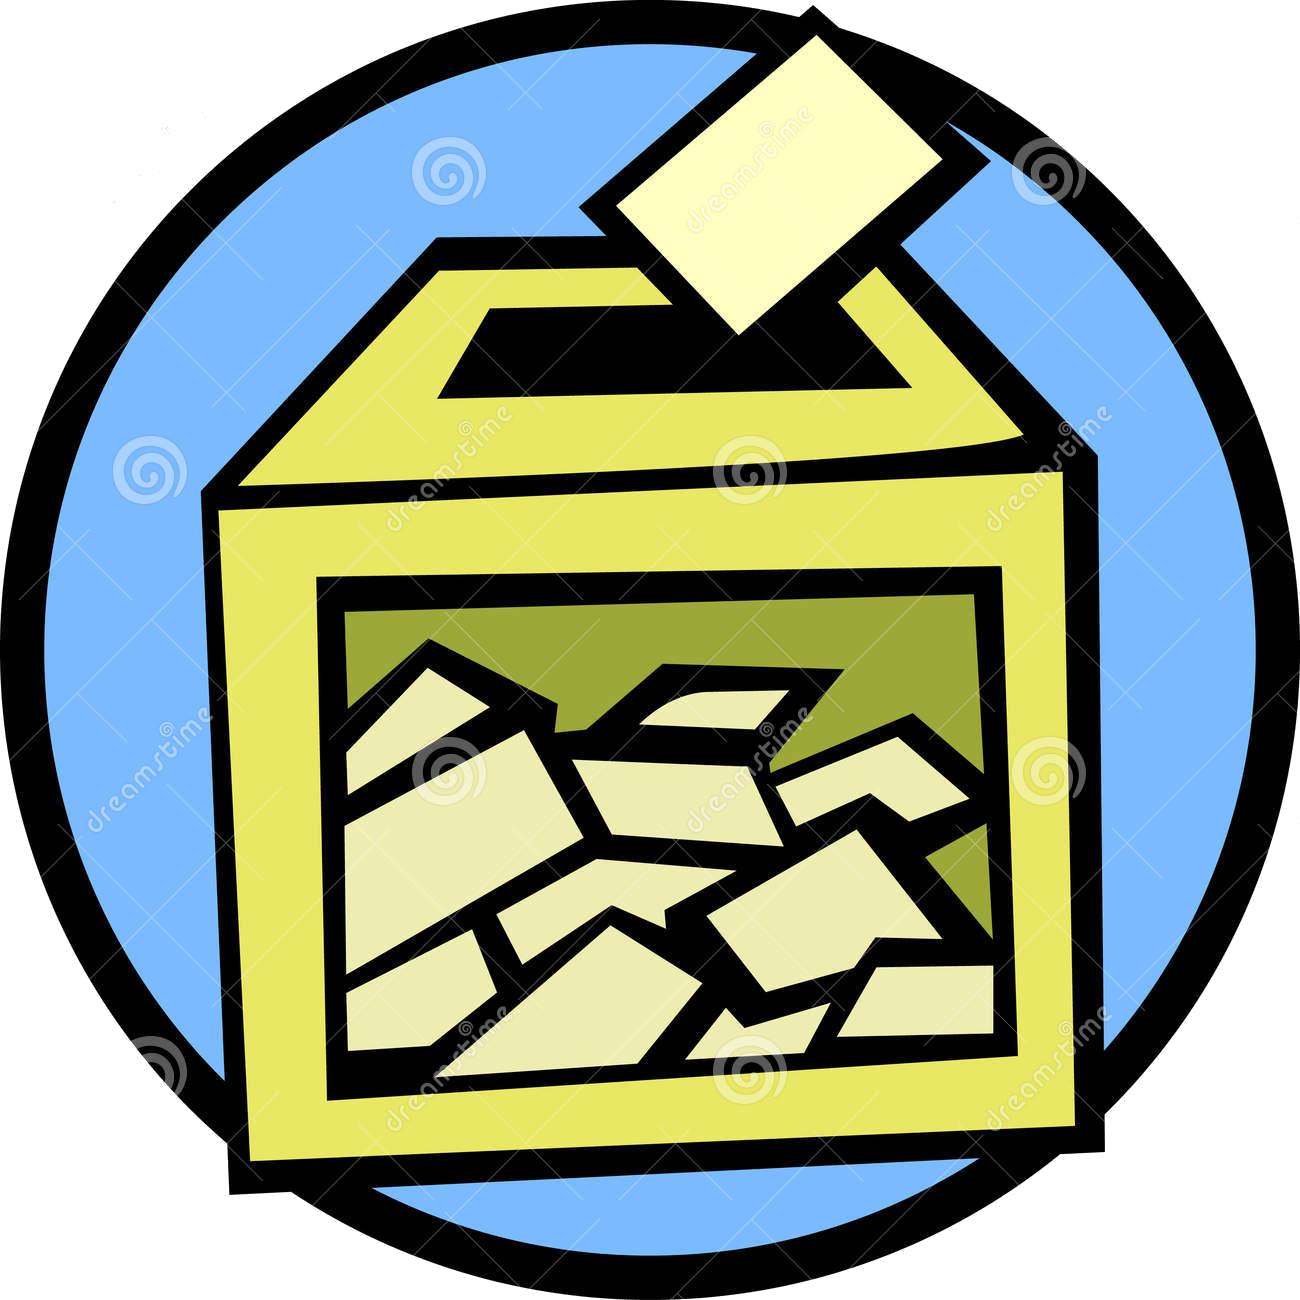 raffle clipart lucky draw box